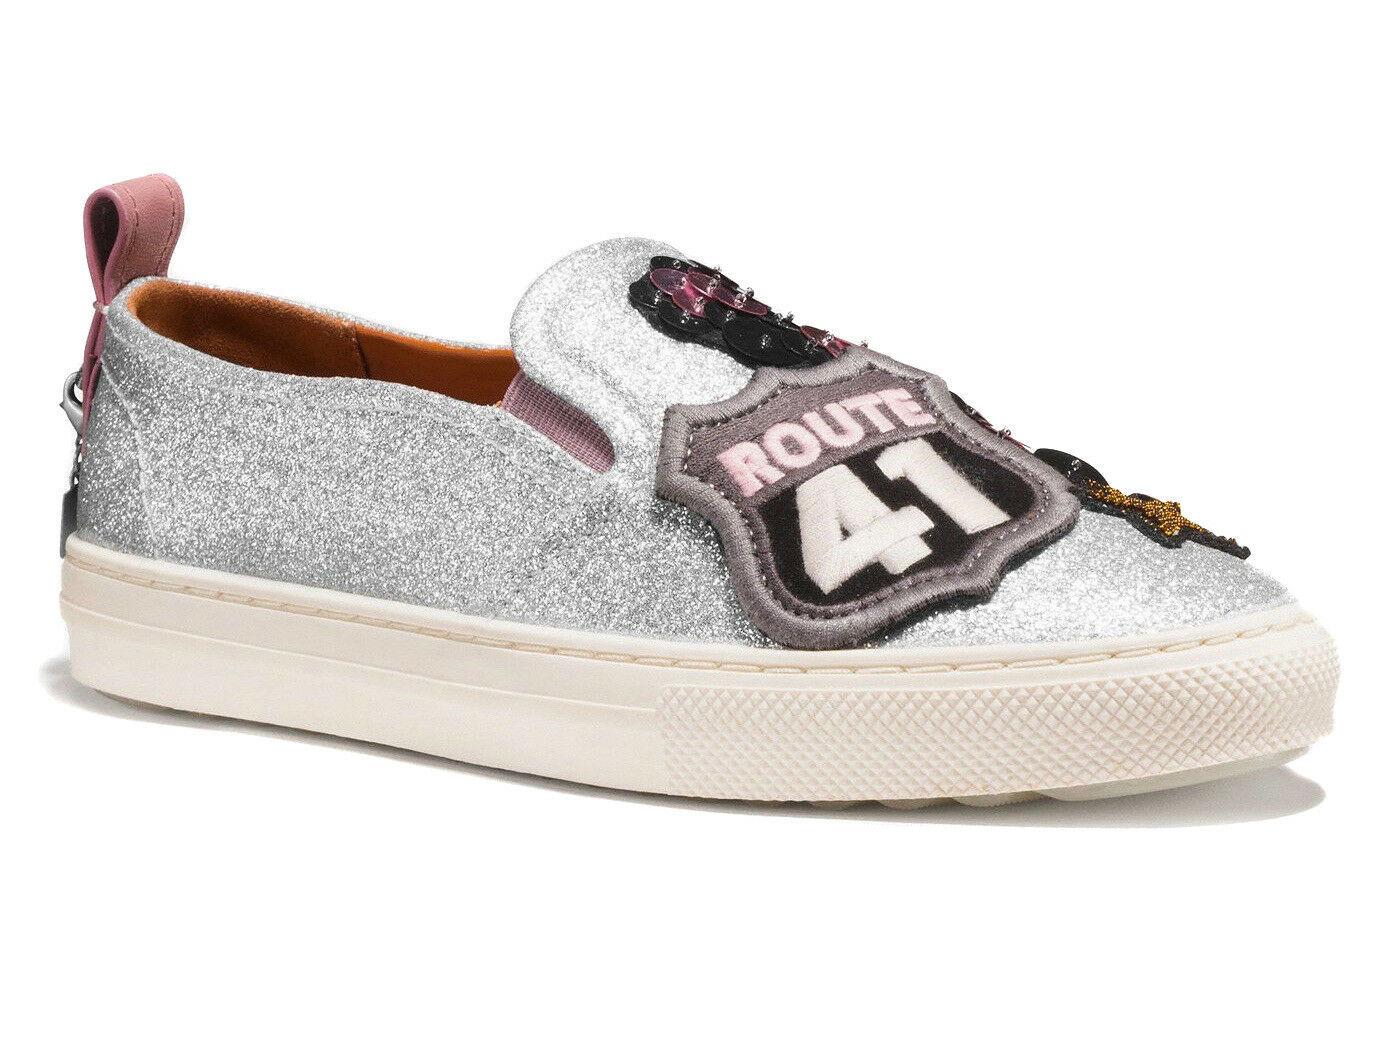 Coach Women's Slip On Skate Shoes Fashion Sneakers C115 Cherry Glitter Silver